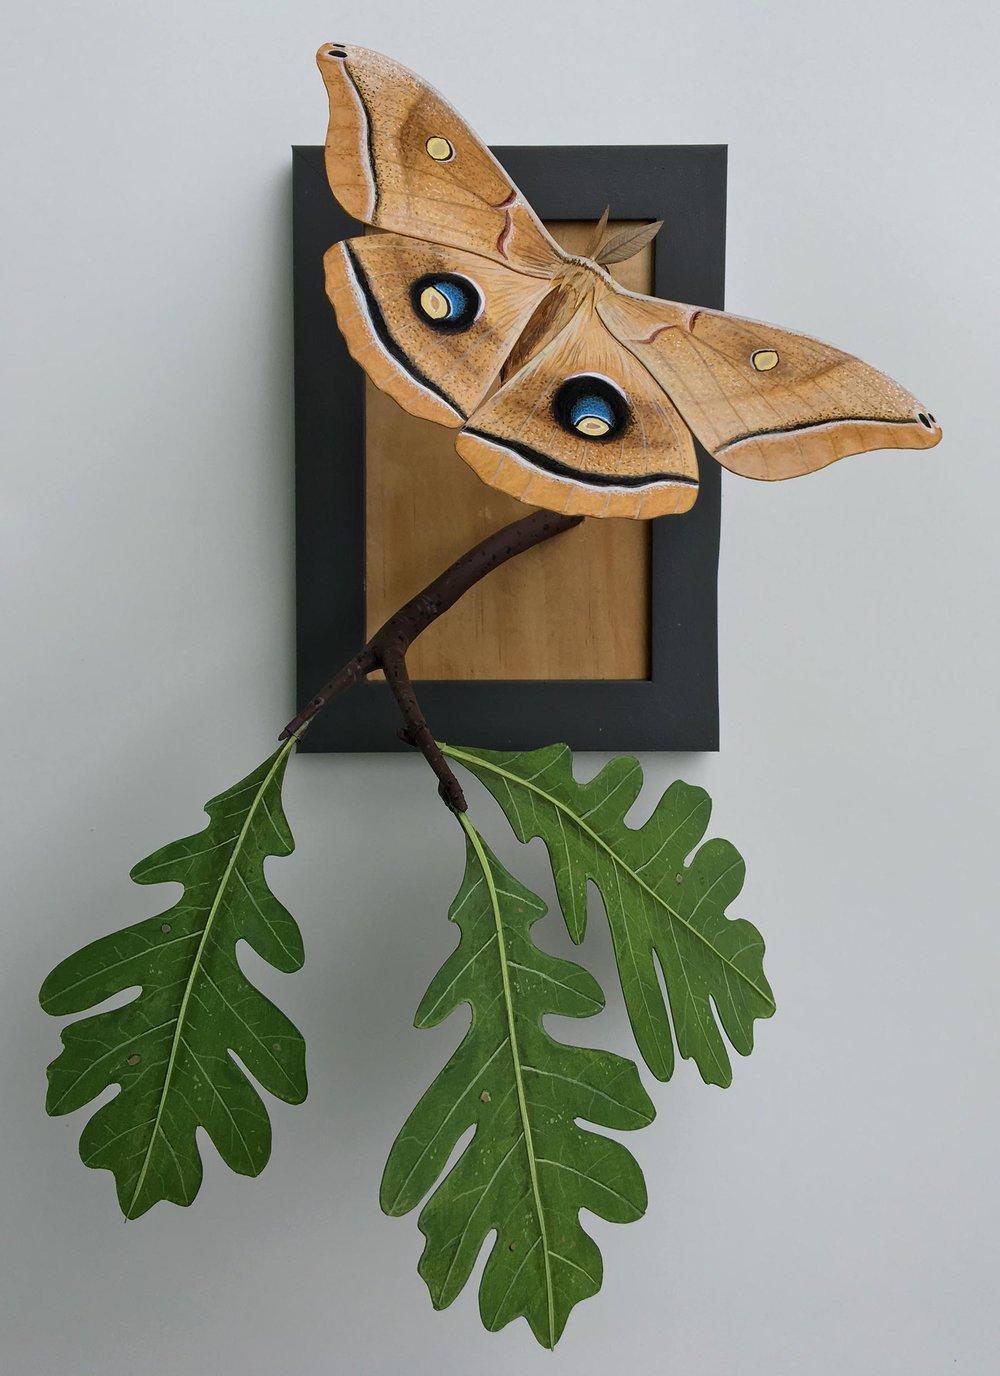 Polyphemus Moth - Gyandromorph